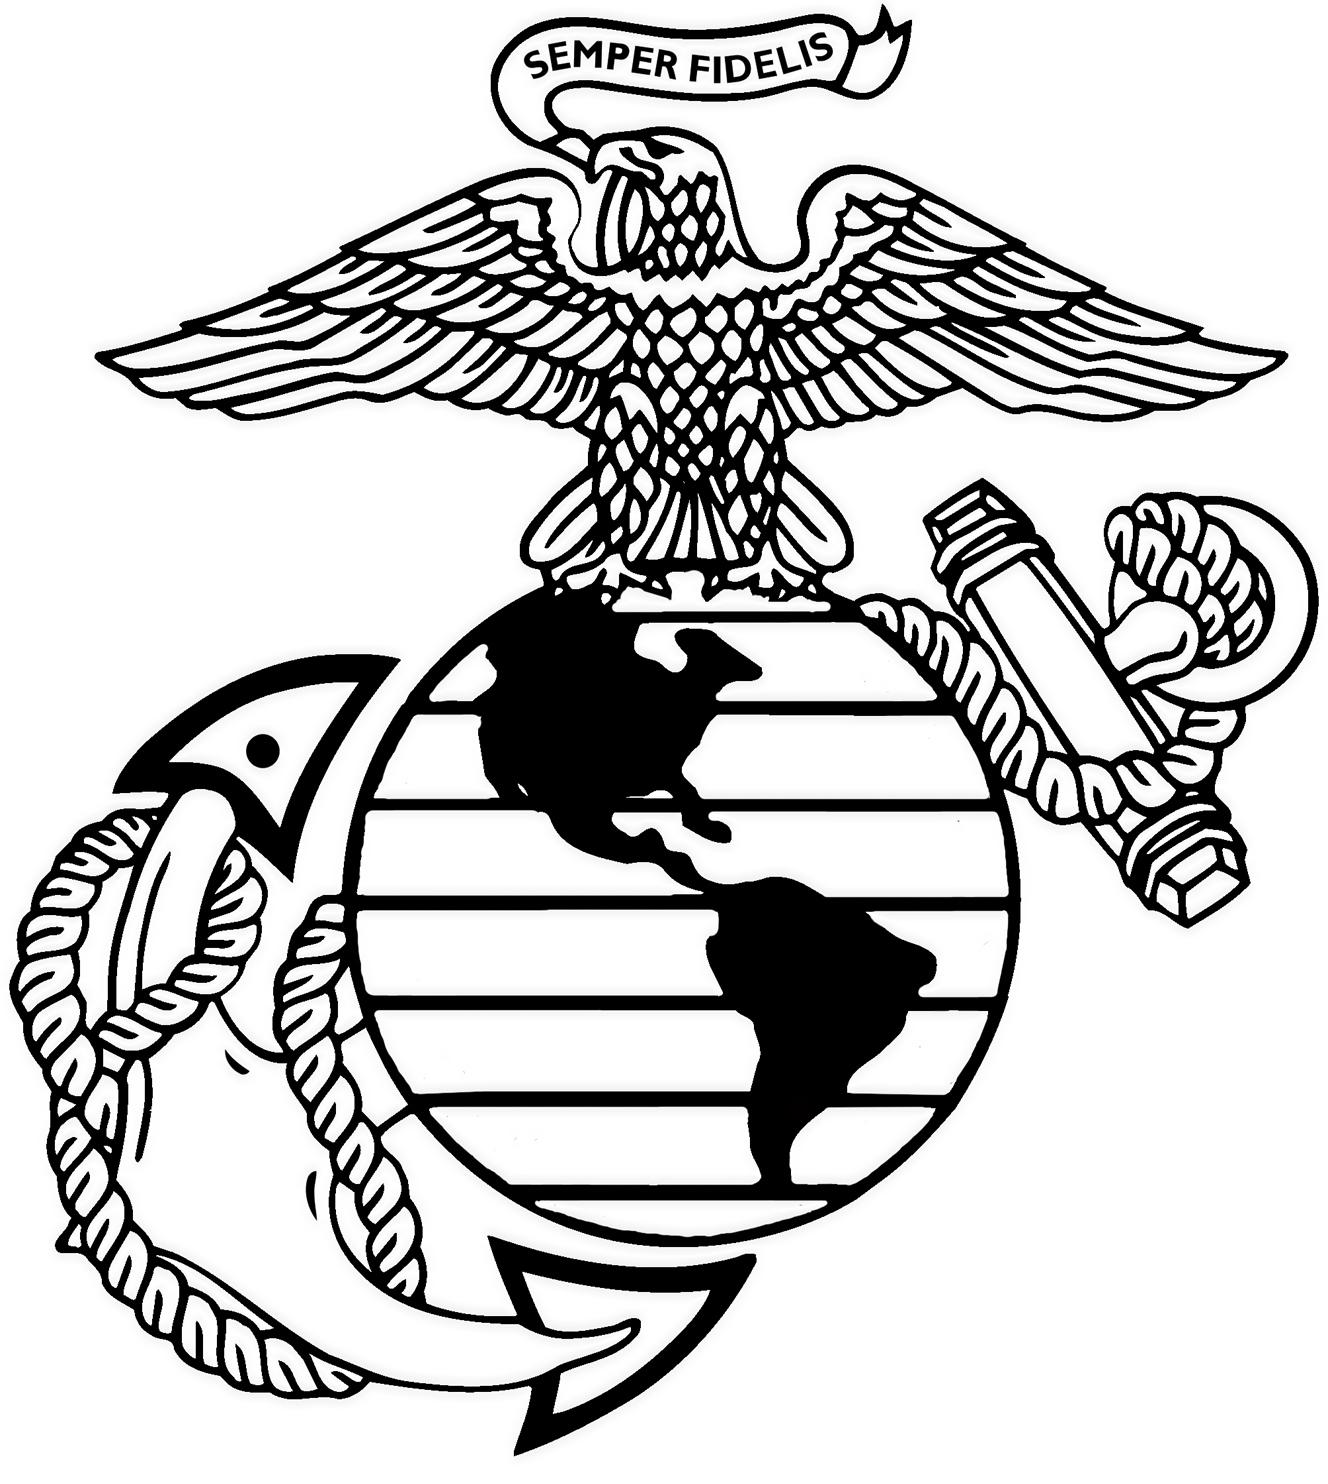 Usmc Emblem Drawing At Getdrawings